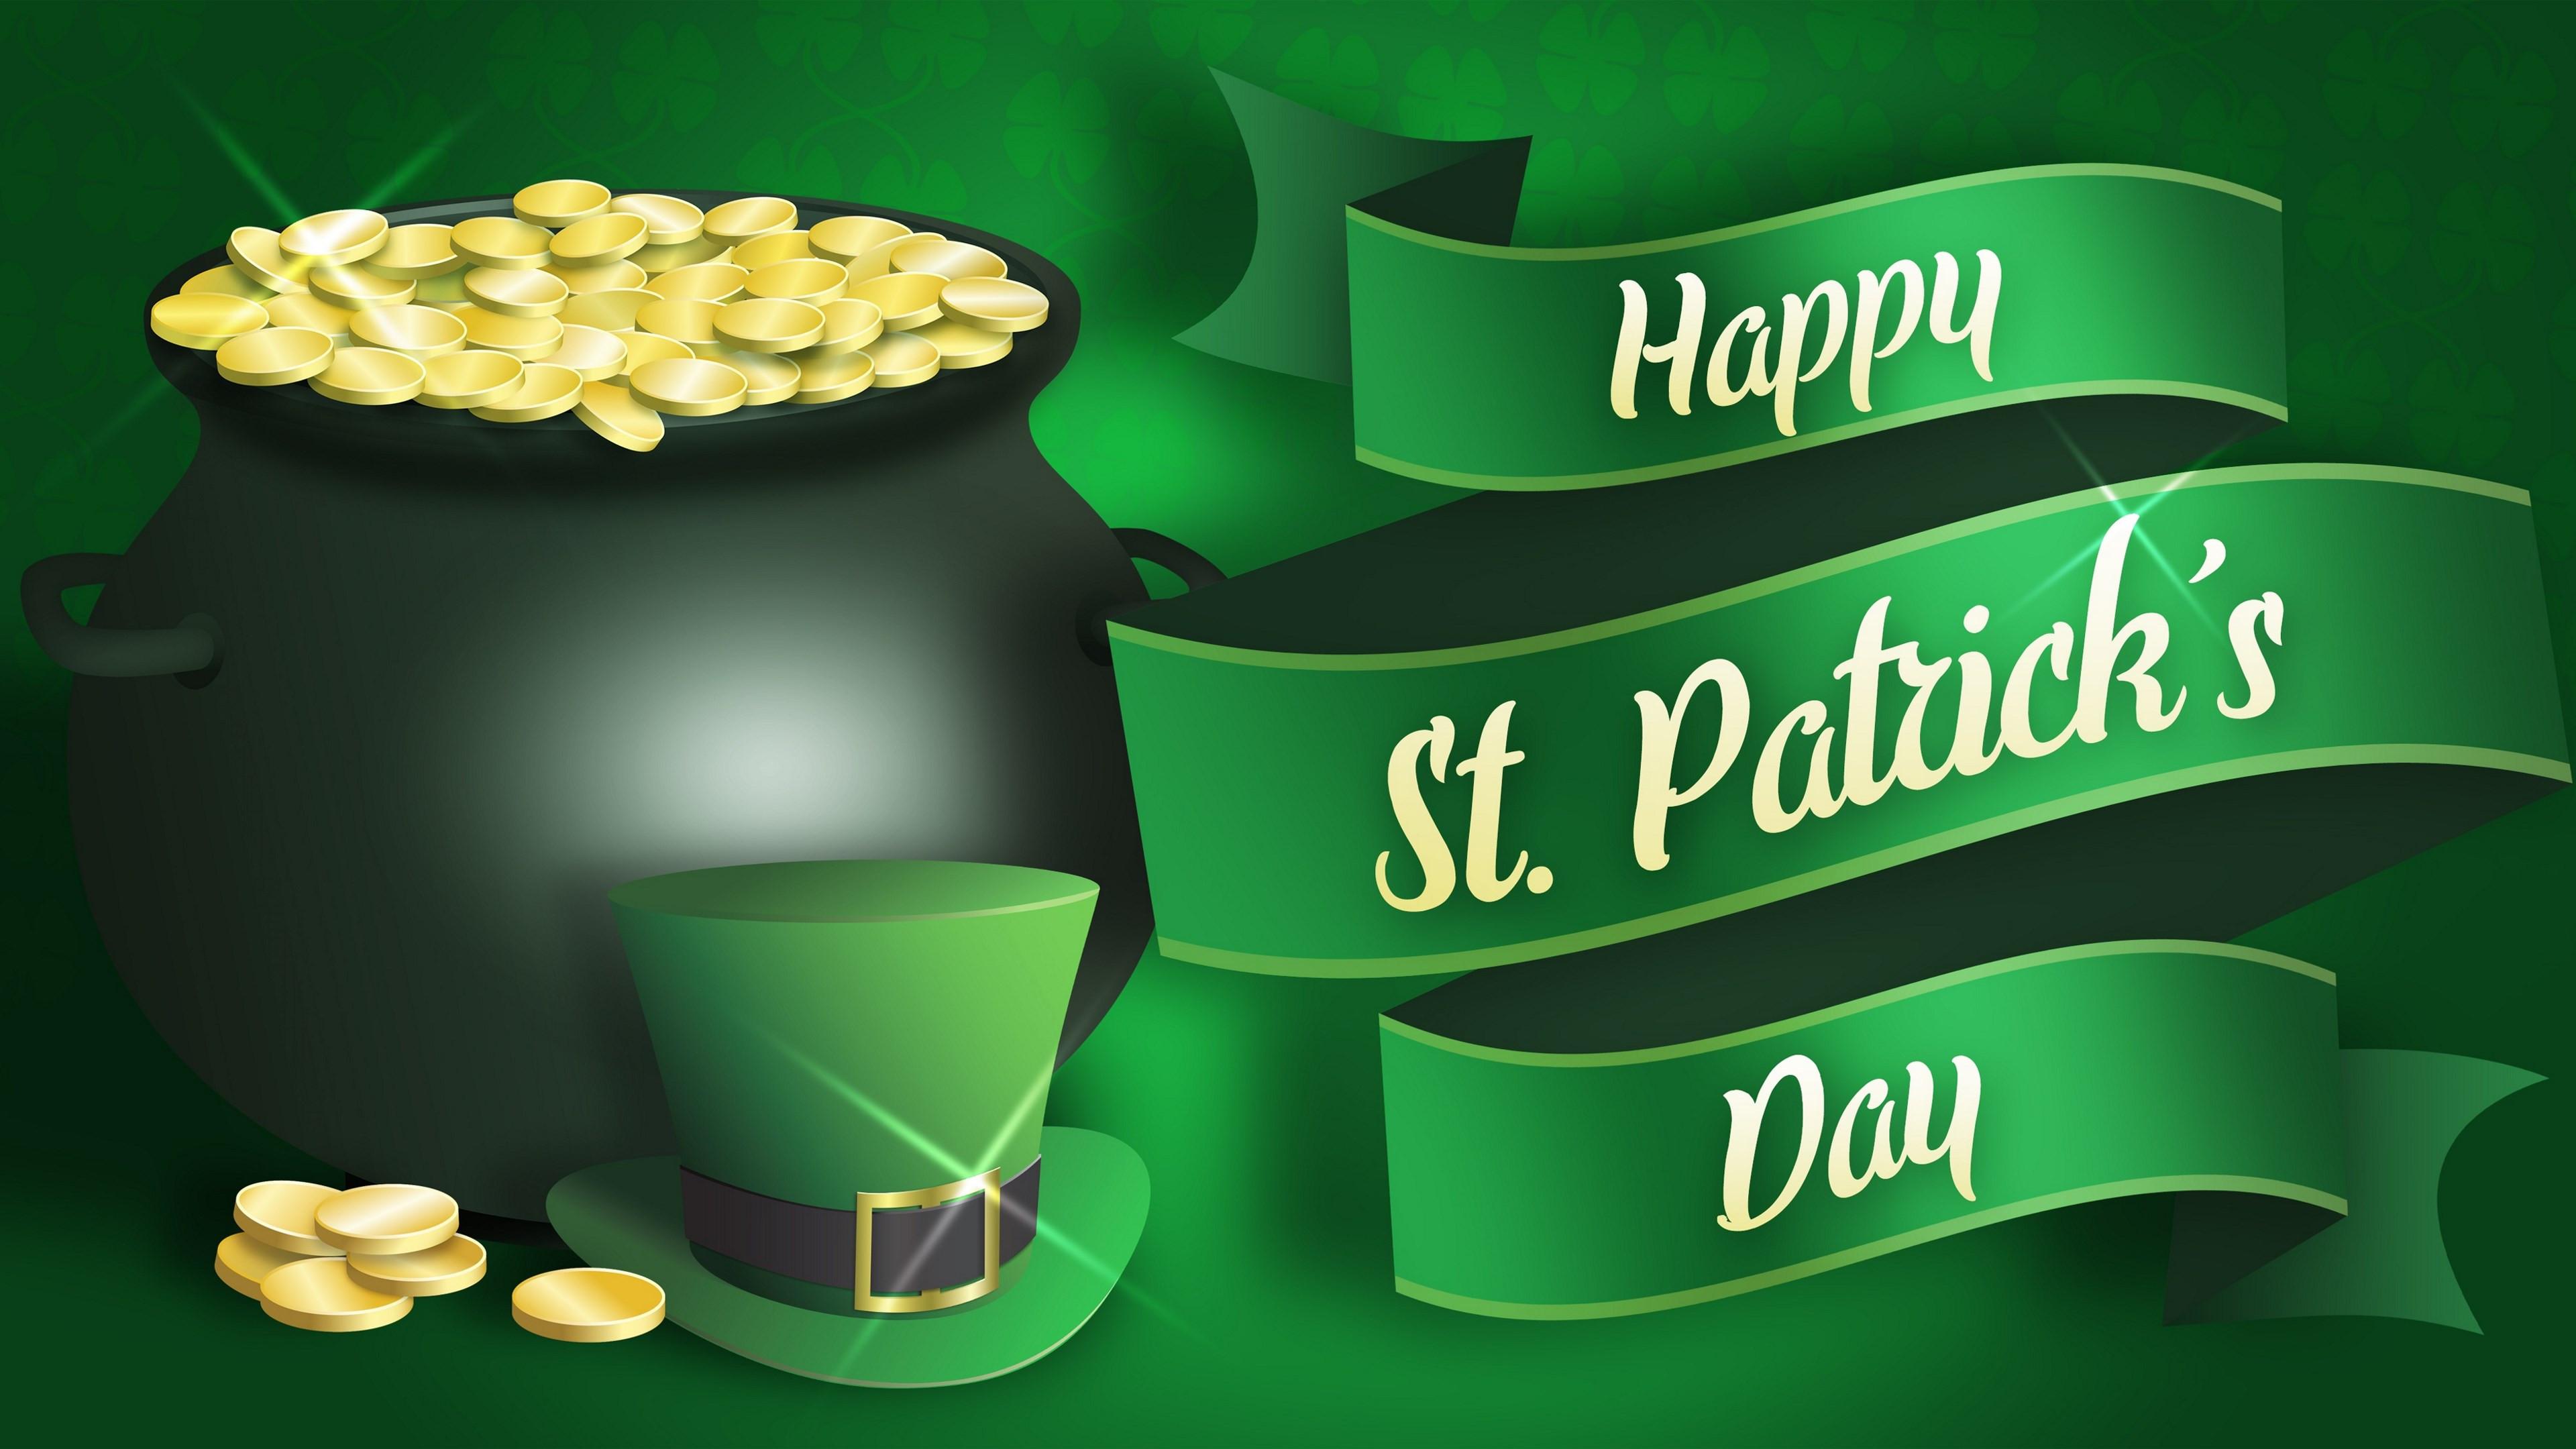 Download Wallpaper Happy Saint Patrick S Day 3840x2160